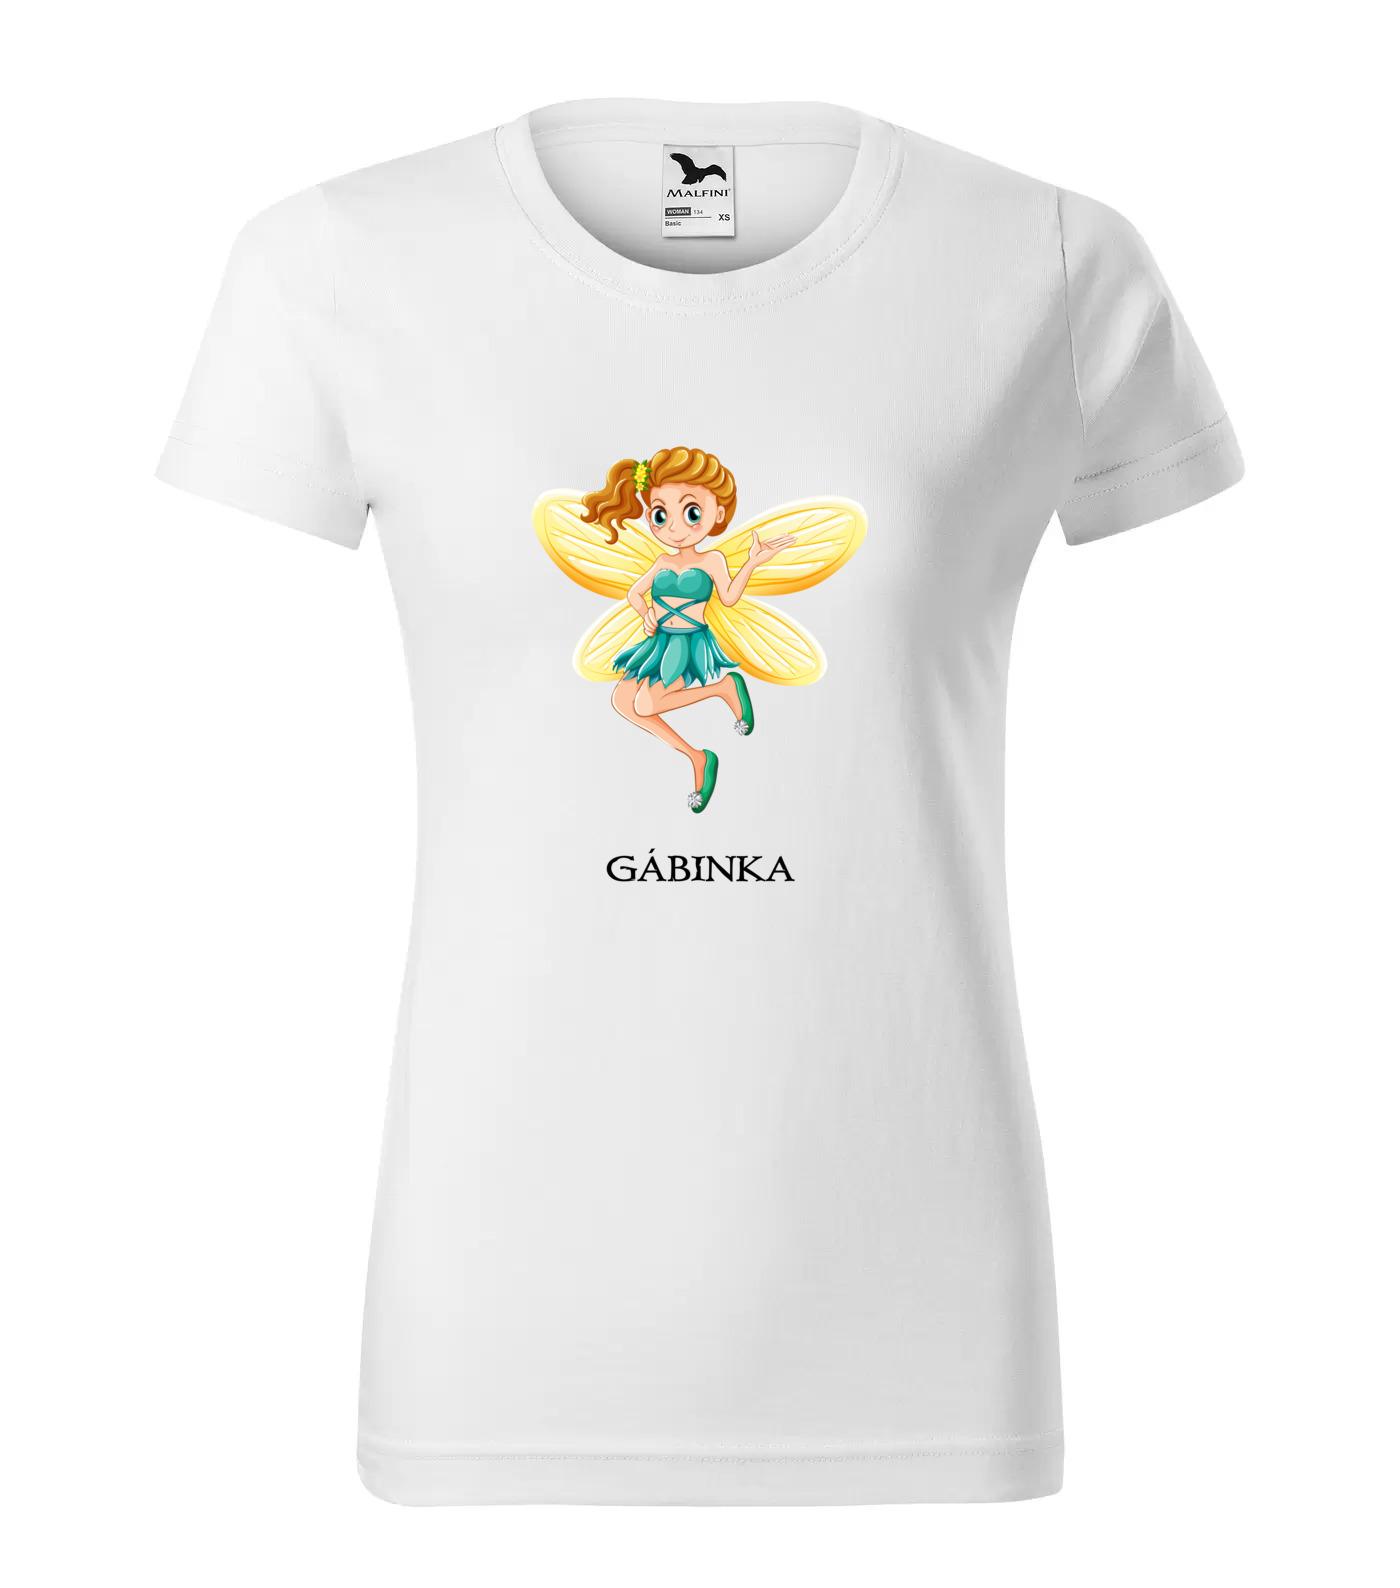 Tričko Víla Gábinka